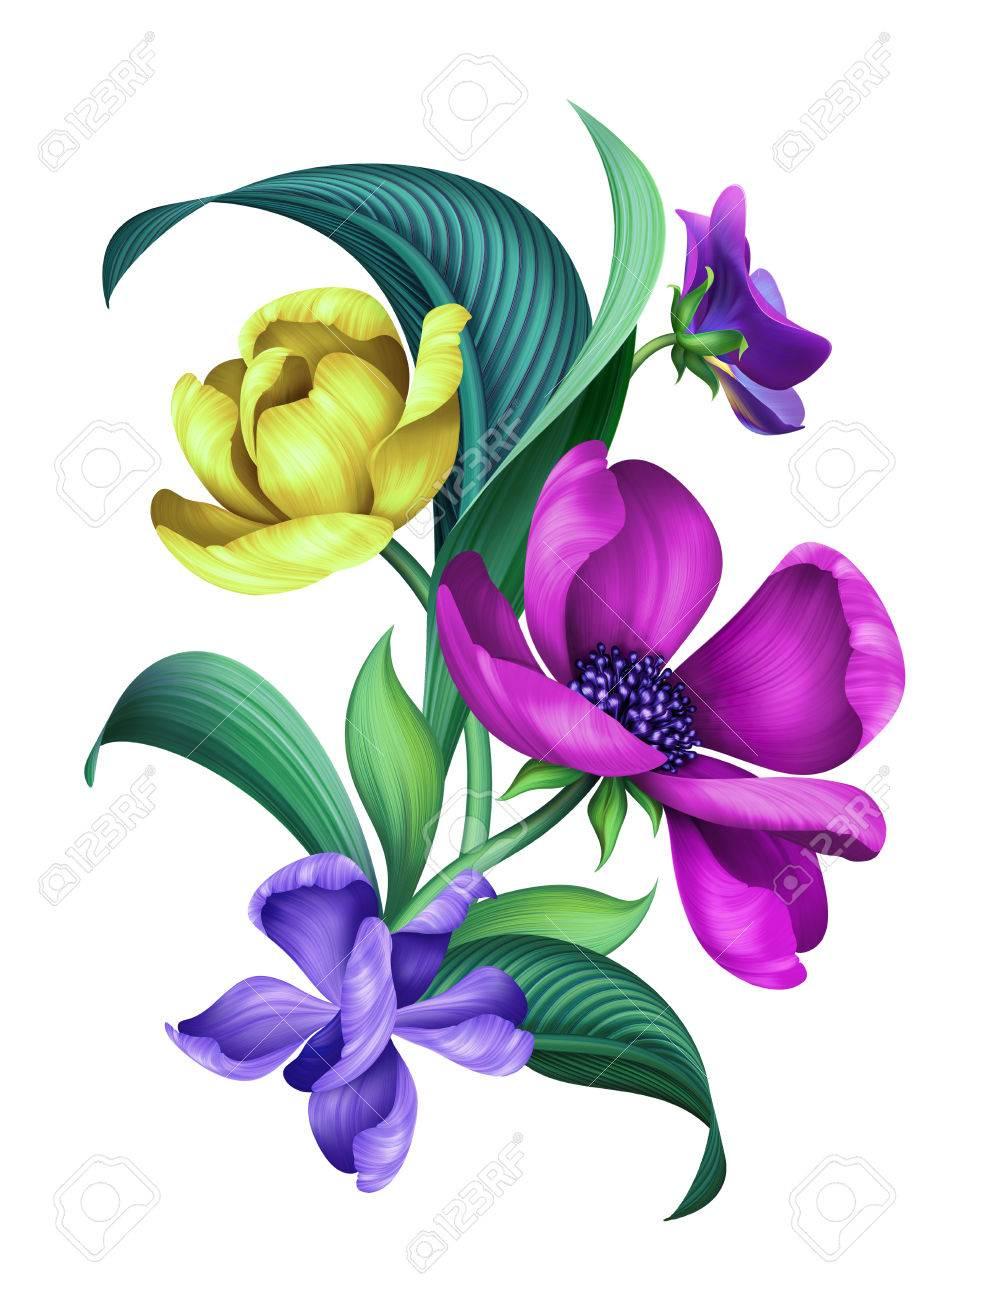 Ilustracion Botanica Adornos Florales Modernos Ramo De Flores - Adornos-florales